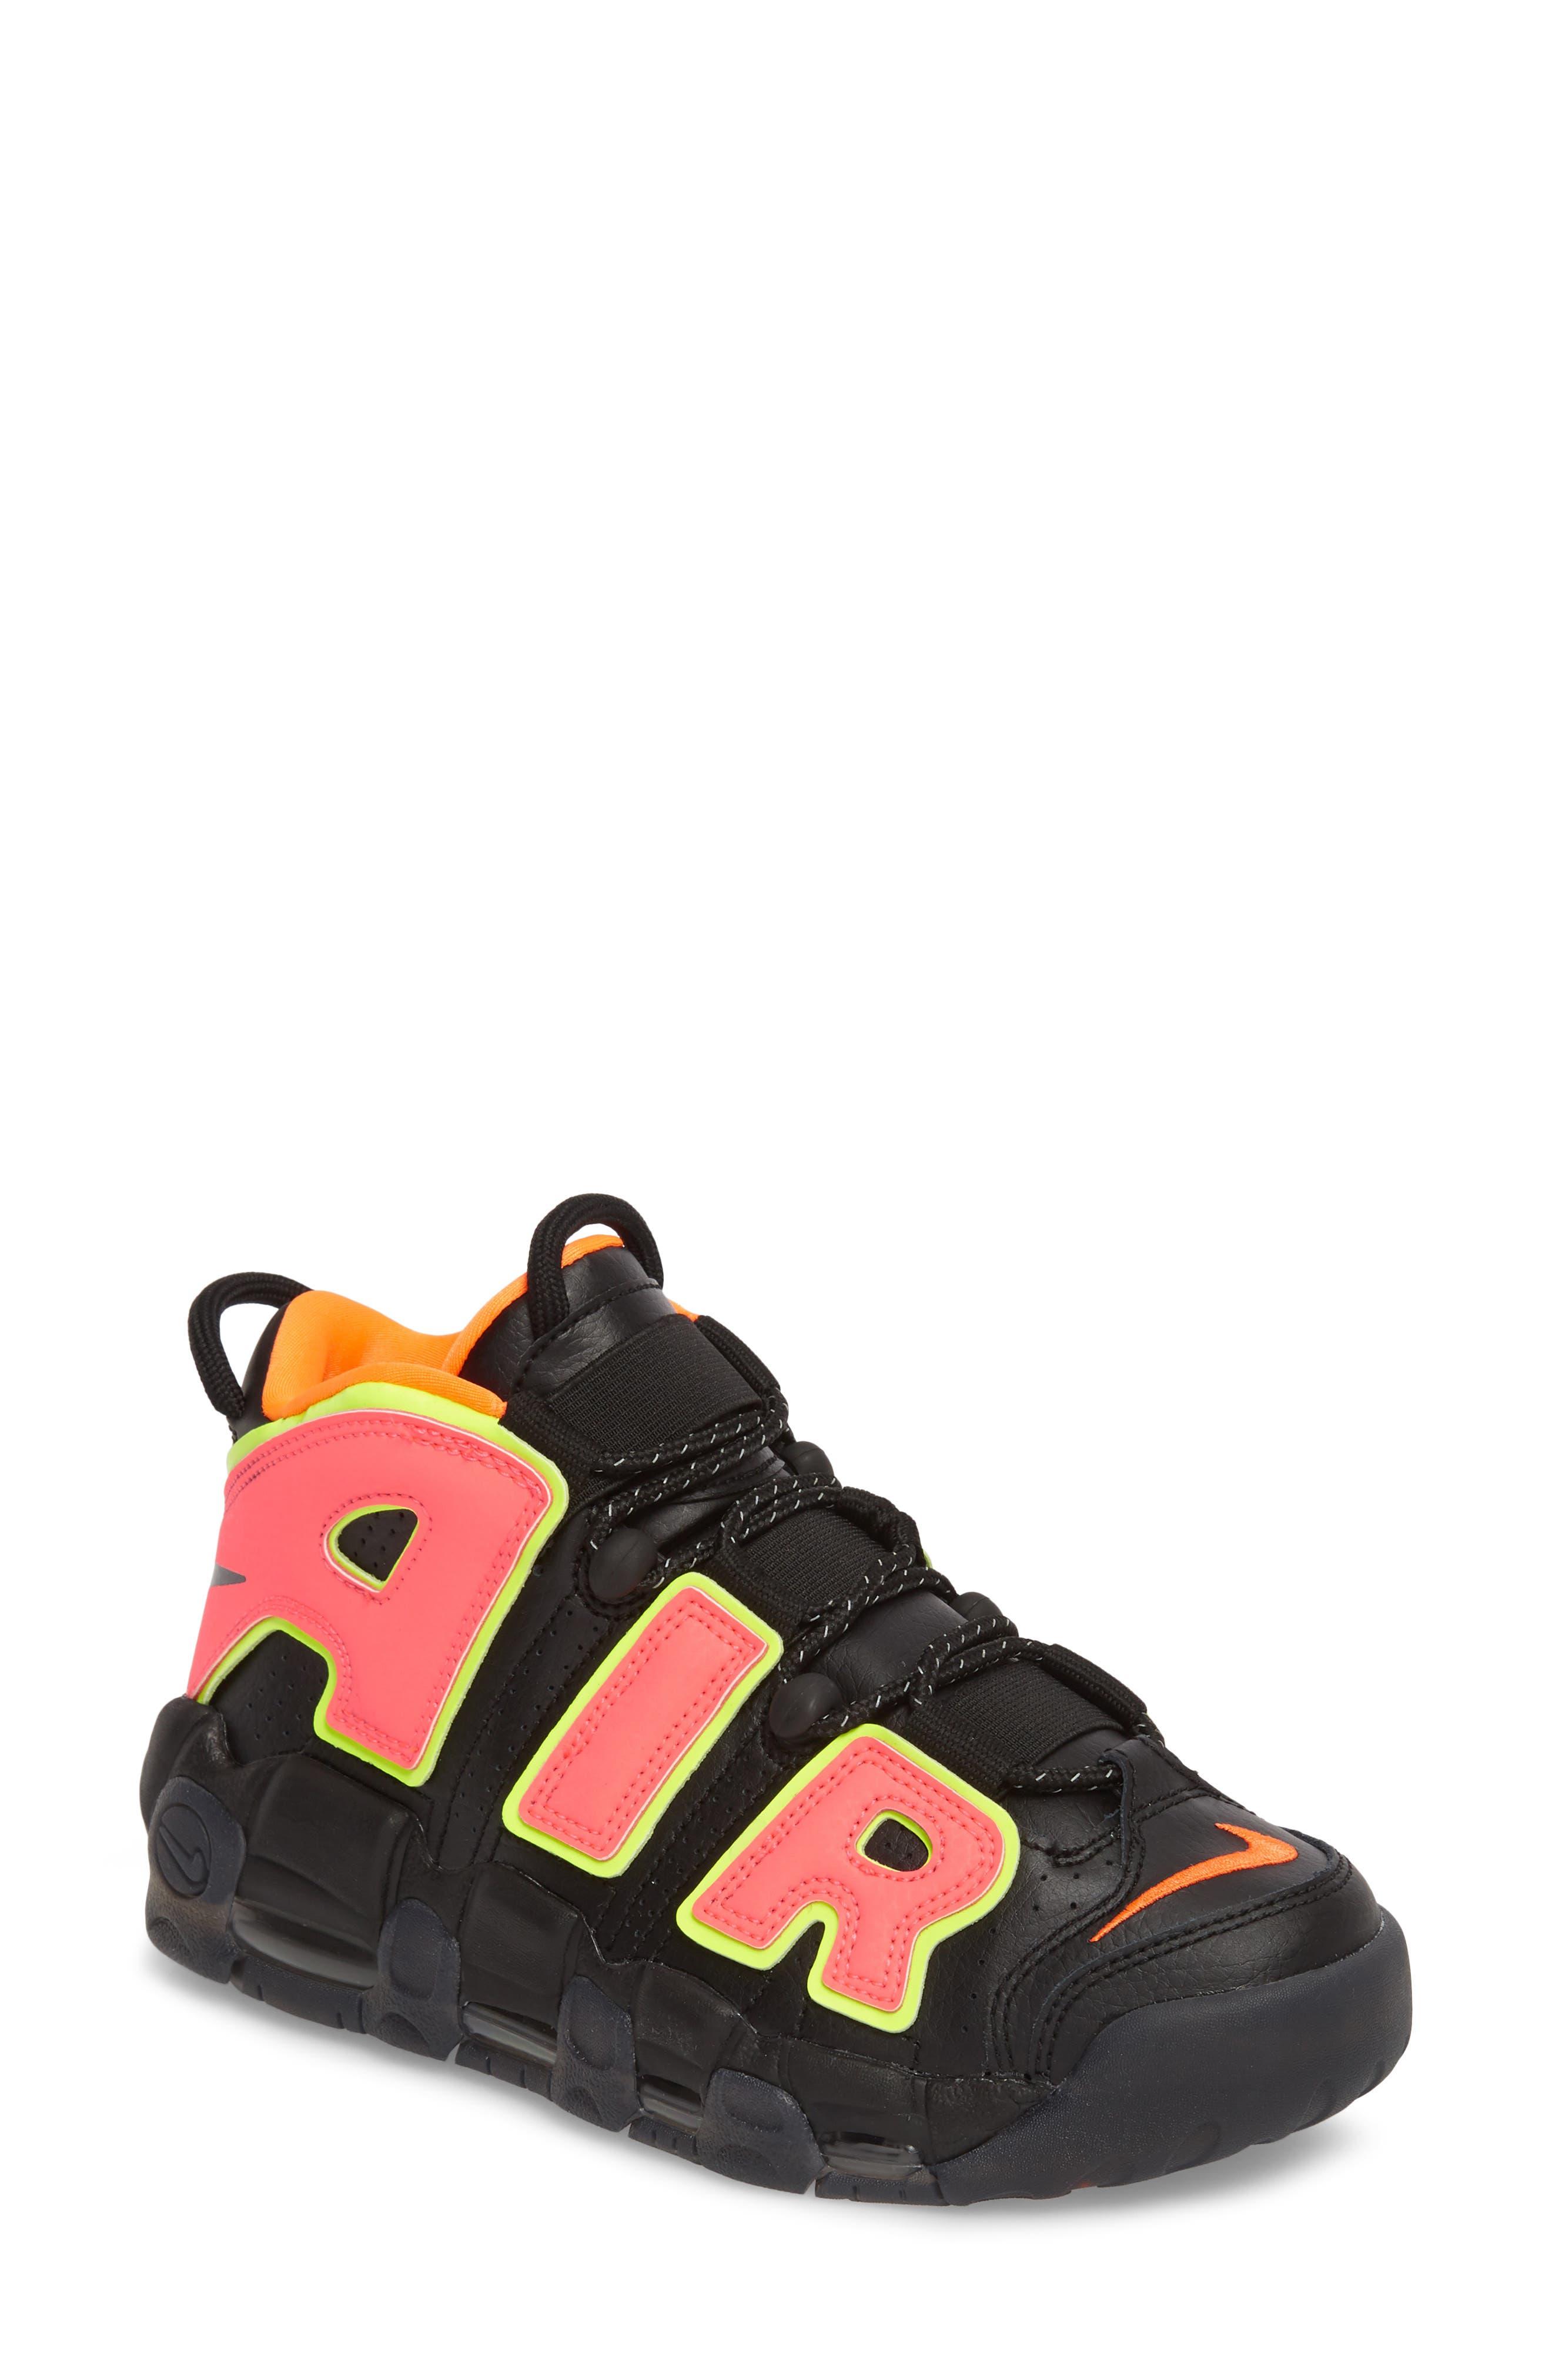 Air More Uptempo Sneaker,                         Main,                         color, Black/ Punch/ Total Orange